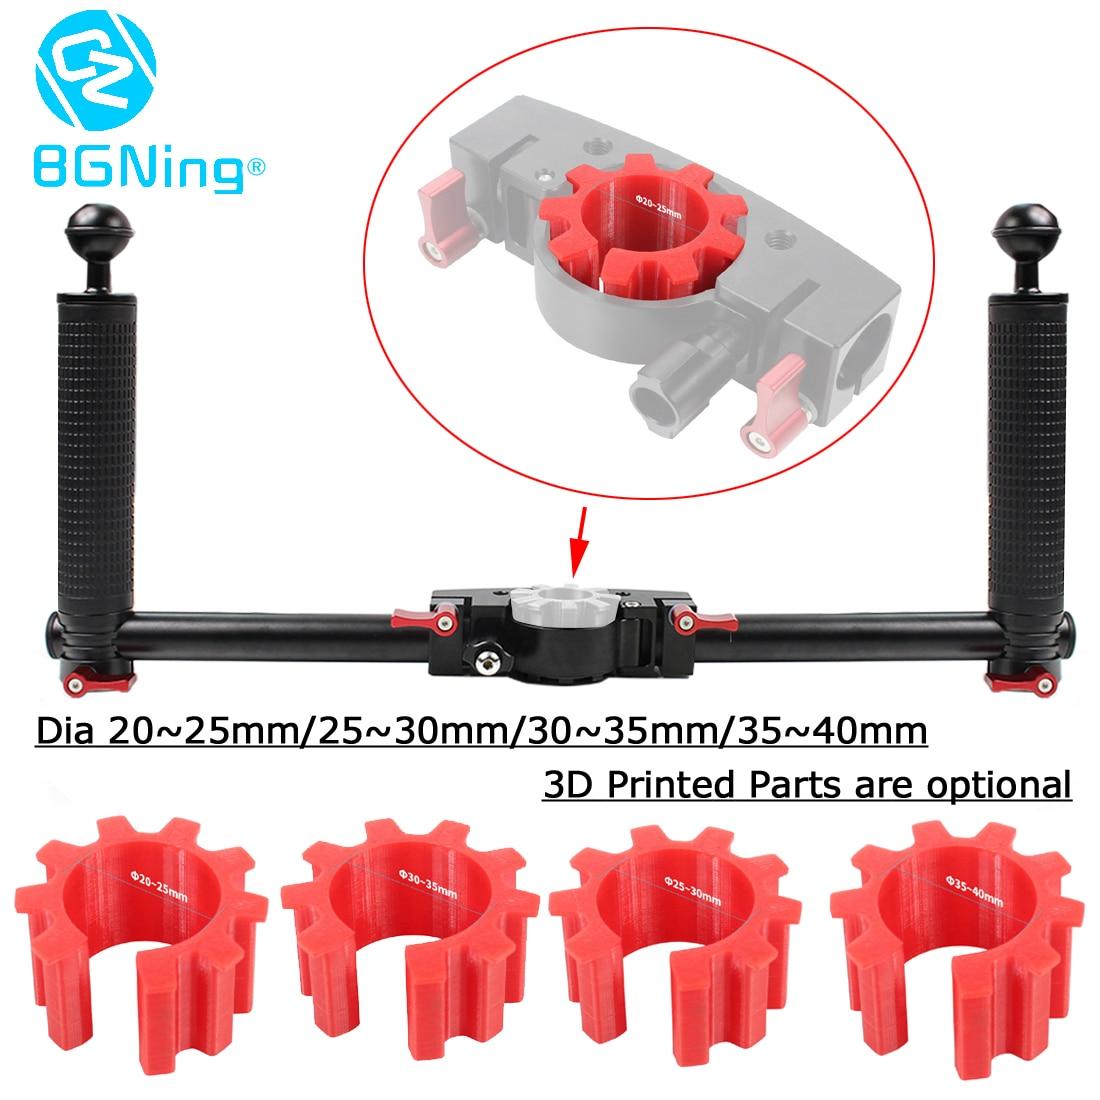 SLR Camera Holder Dual Handheld Grip Stabilizer Extended DSLR Mount Bracket 3D Printed for DJI/zhi yun/Feiyu Gimbals 40mm Handle